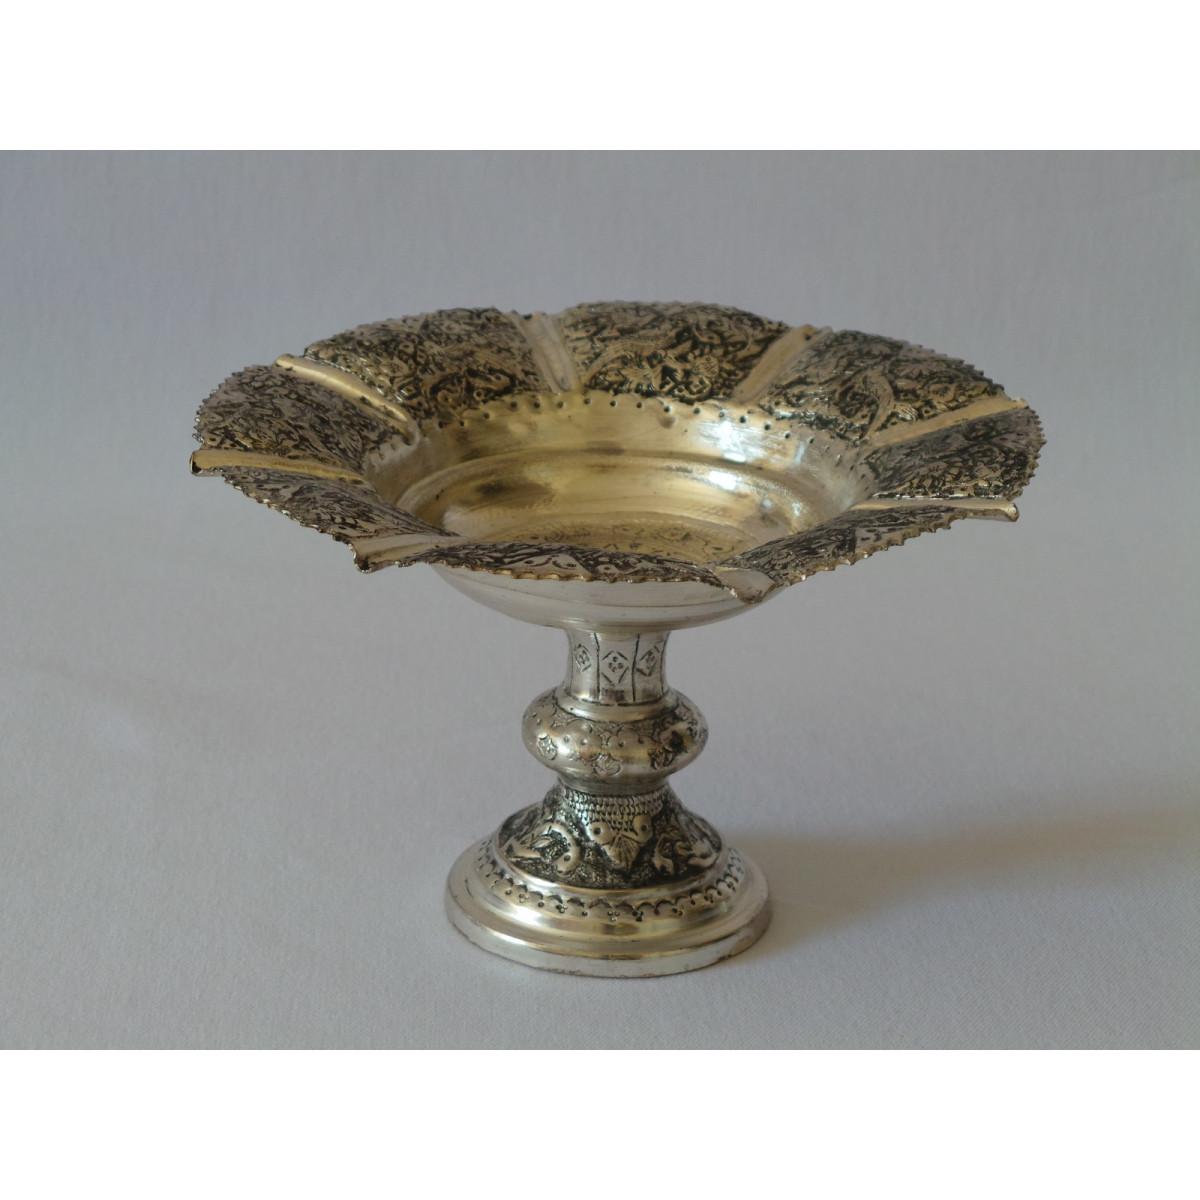 Hand Engraving on Sliver Plated Pedestal Bowl Plate - HG2003-Persian Handicrafts